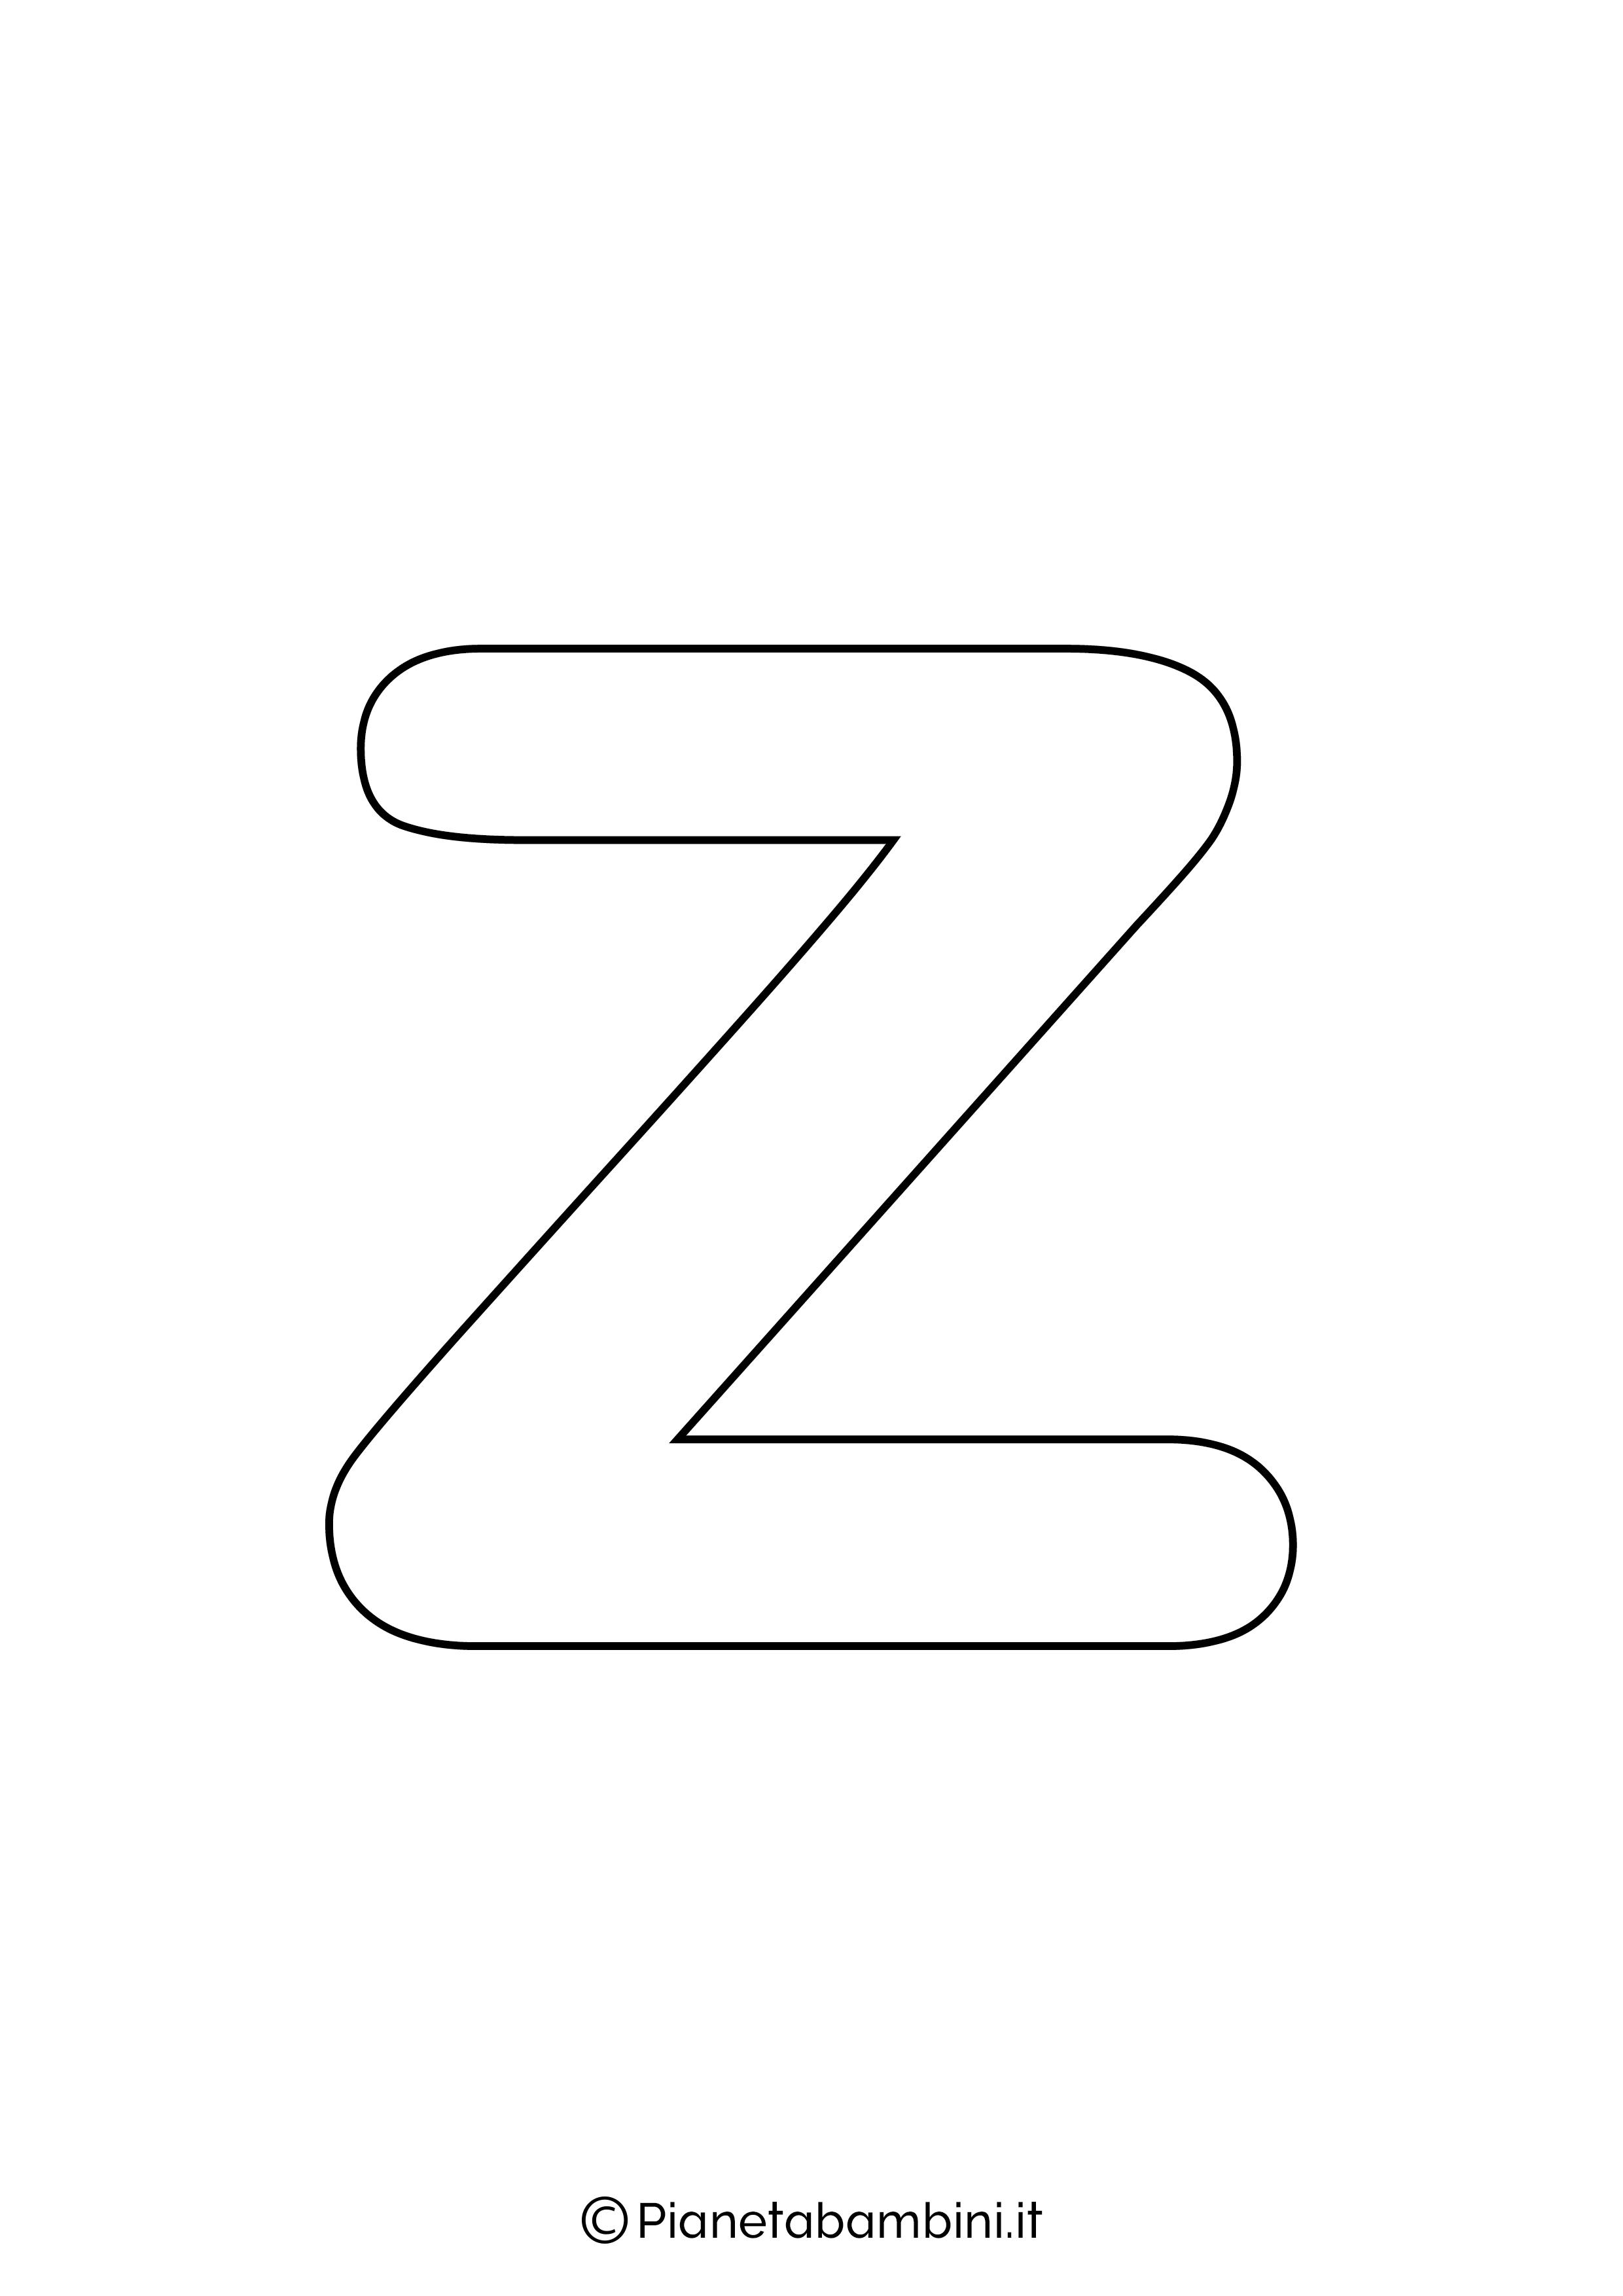 Lettera Z minuscola da stampare